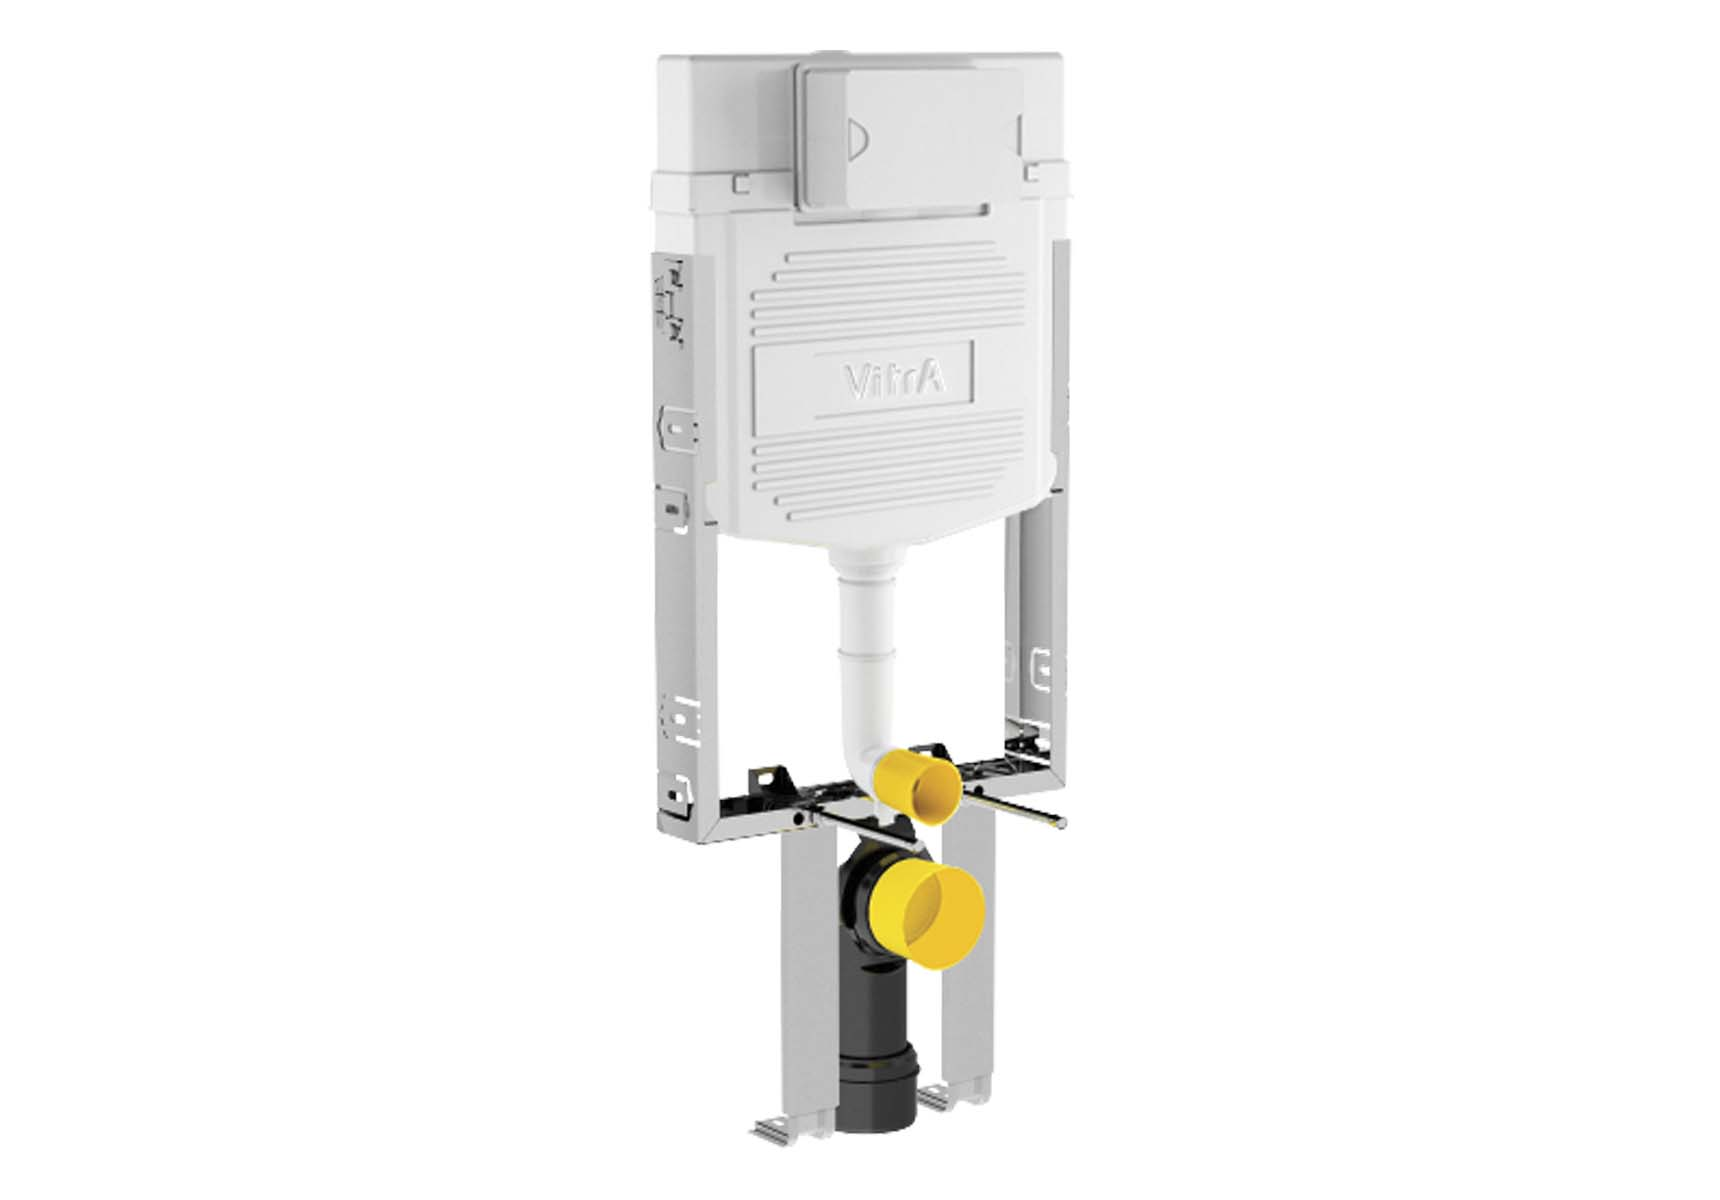 Standard Installation - 2,5 / 4 Liter Concealed Cistern Set (with adjustable thick metal brackets) - 8 cm